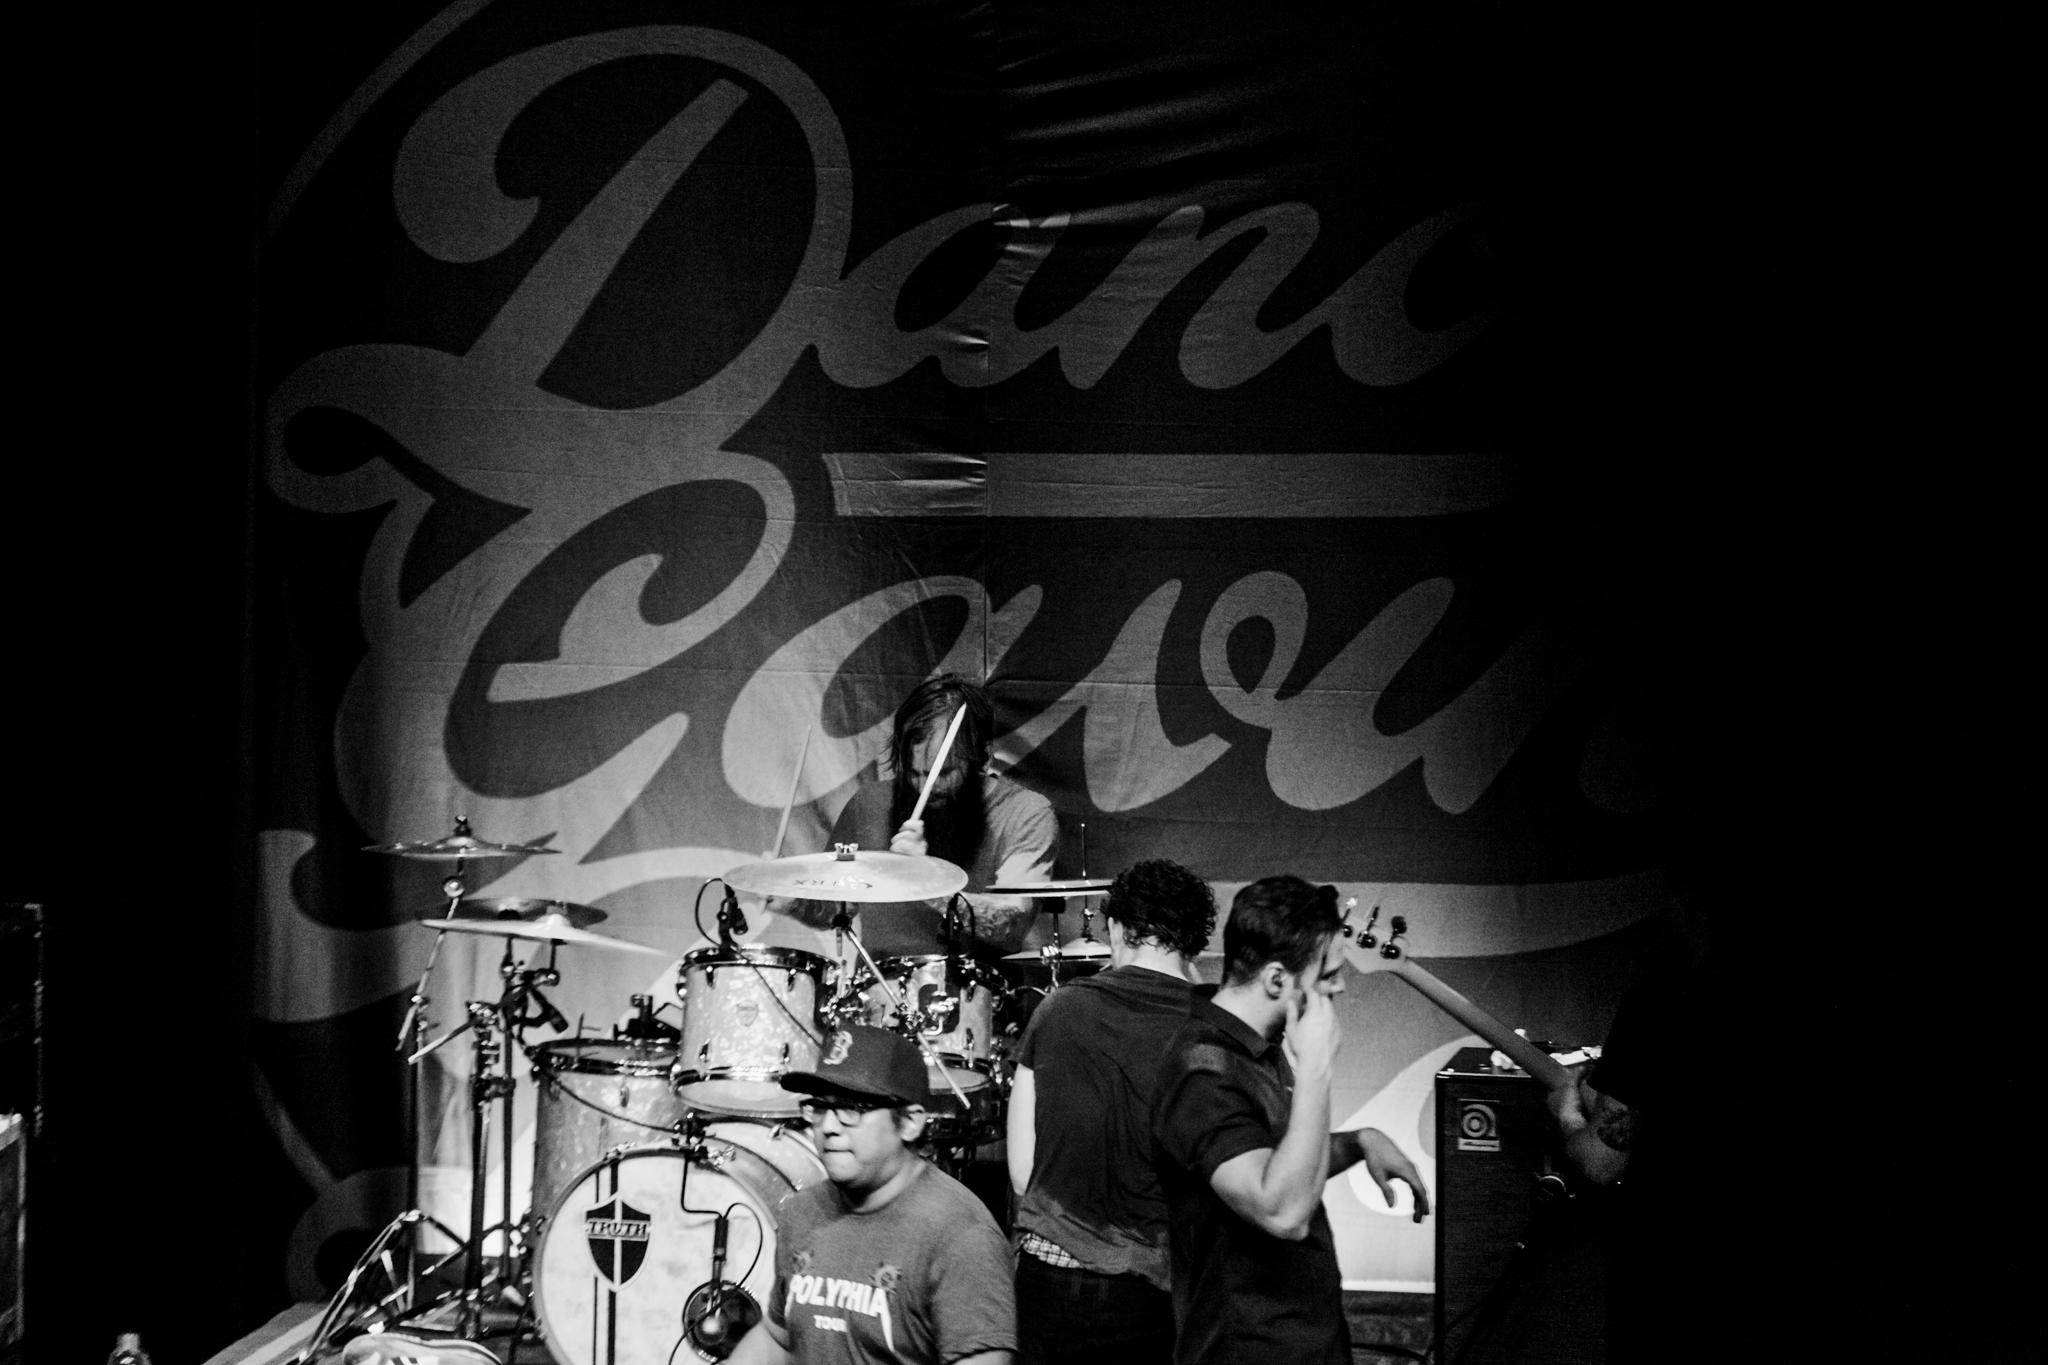 Lafferty Photo - Dance Gavin Dance 03.08.17-8899.jpg